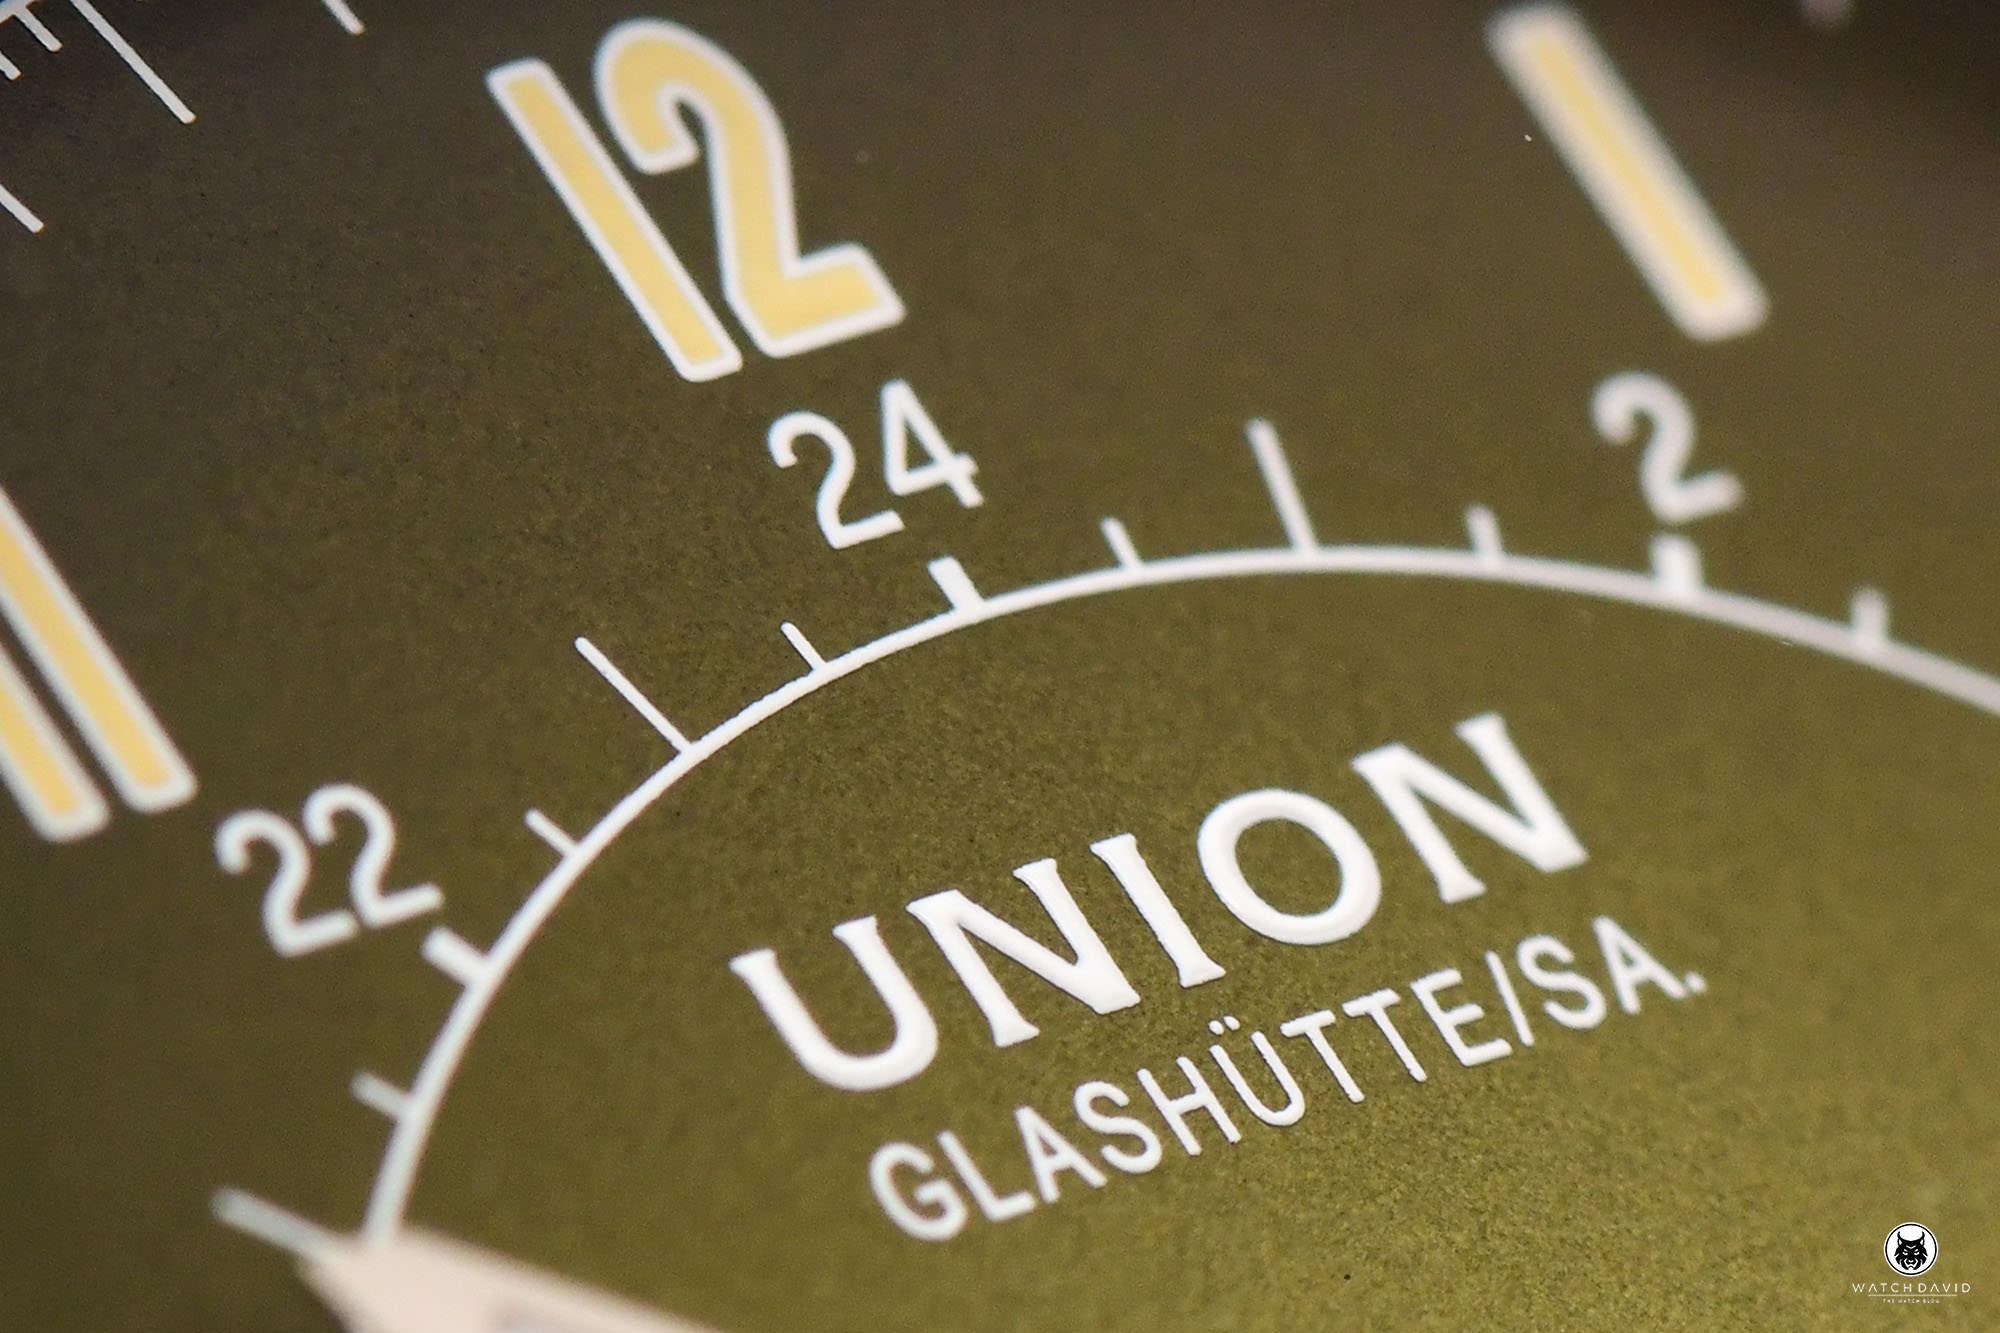 Union Glashütte Belisar Zeitzone Review